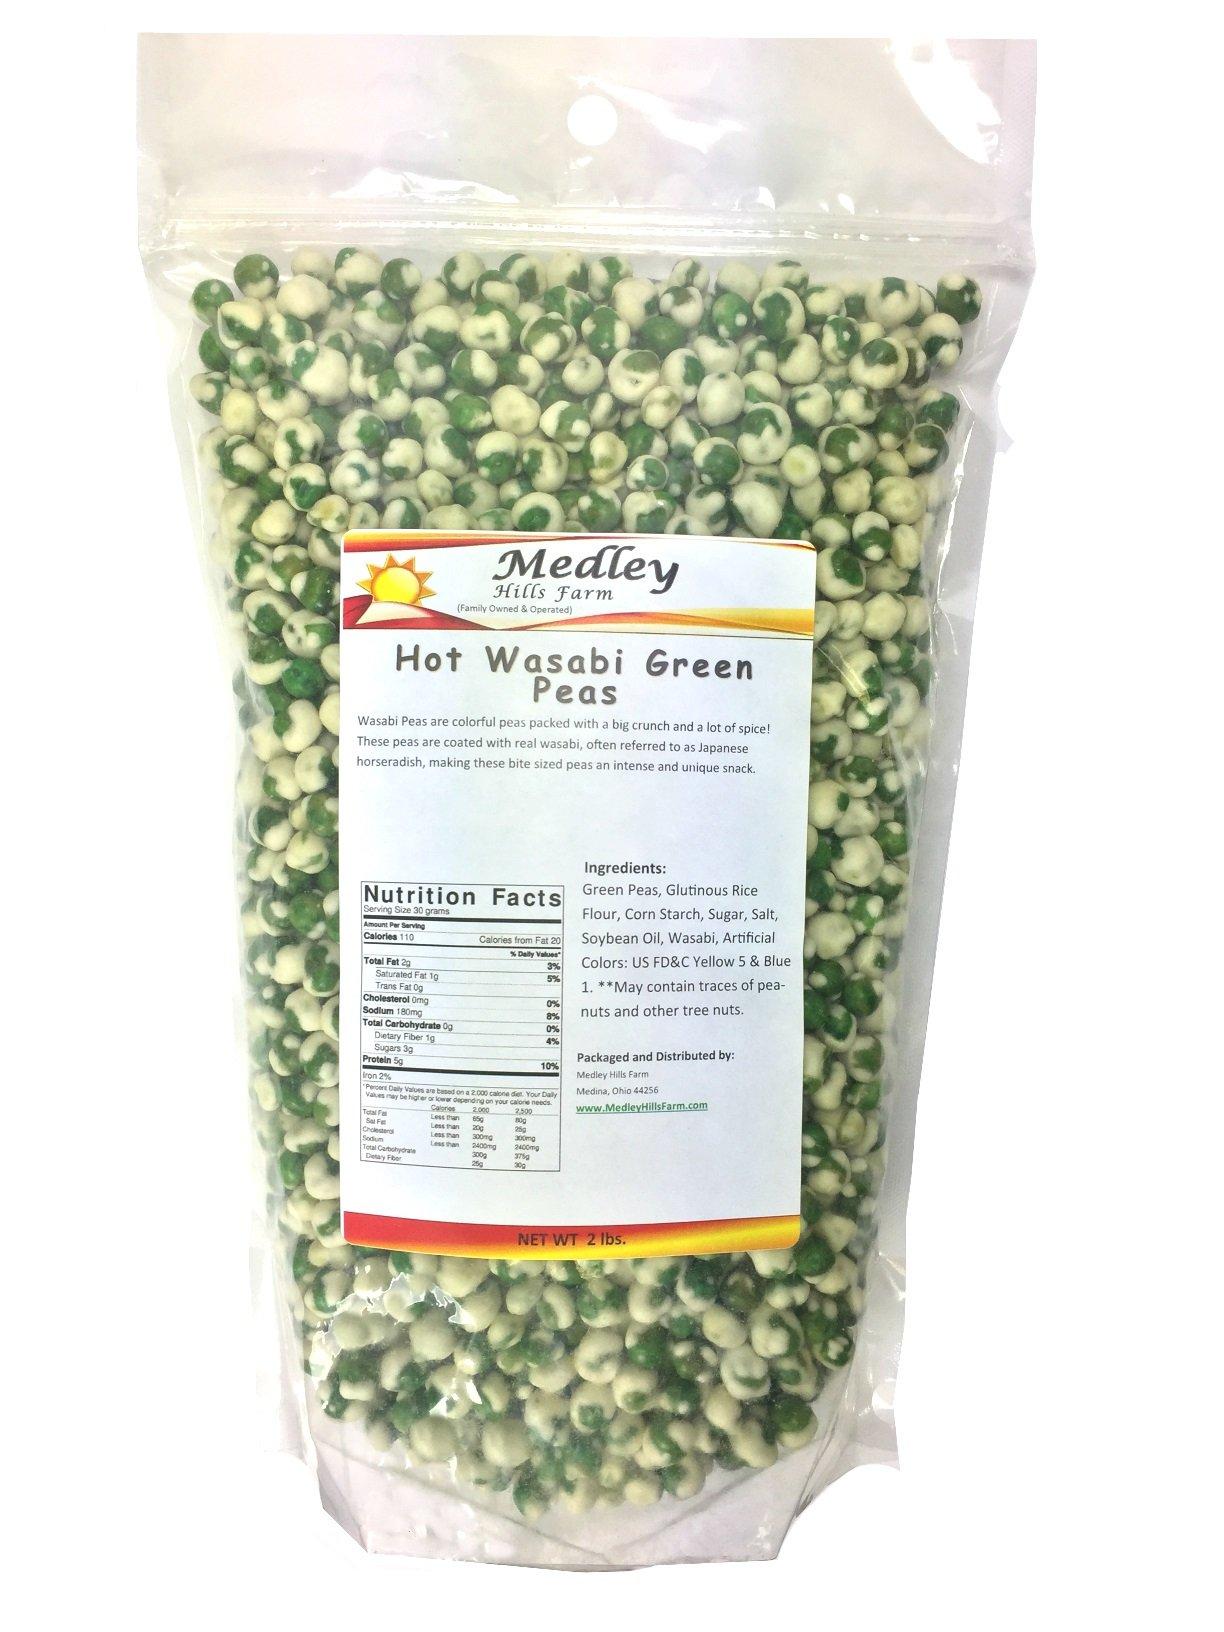 Hot Wasabi Green Peas 2 Lbs by Medley Hills Farm